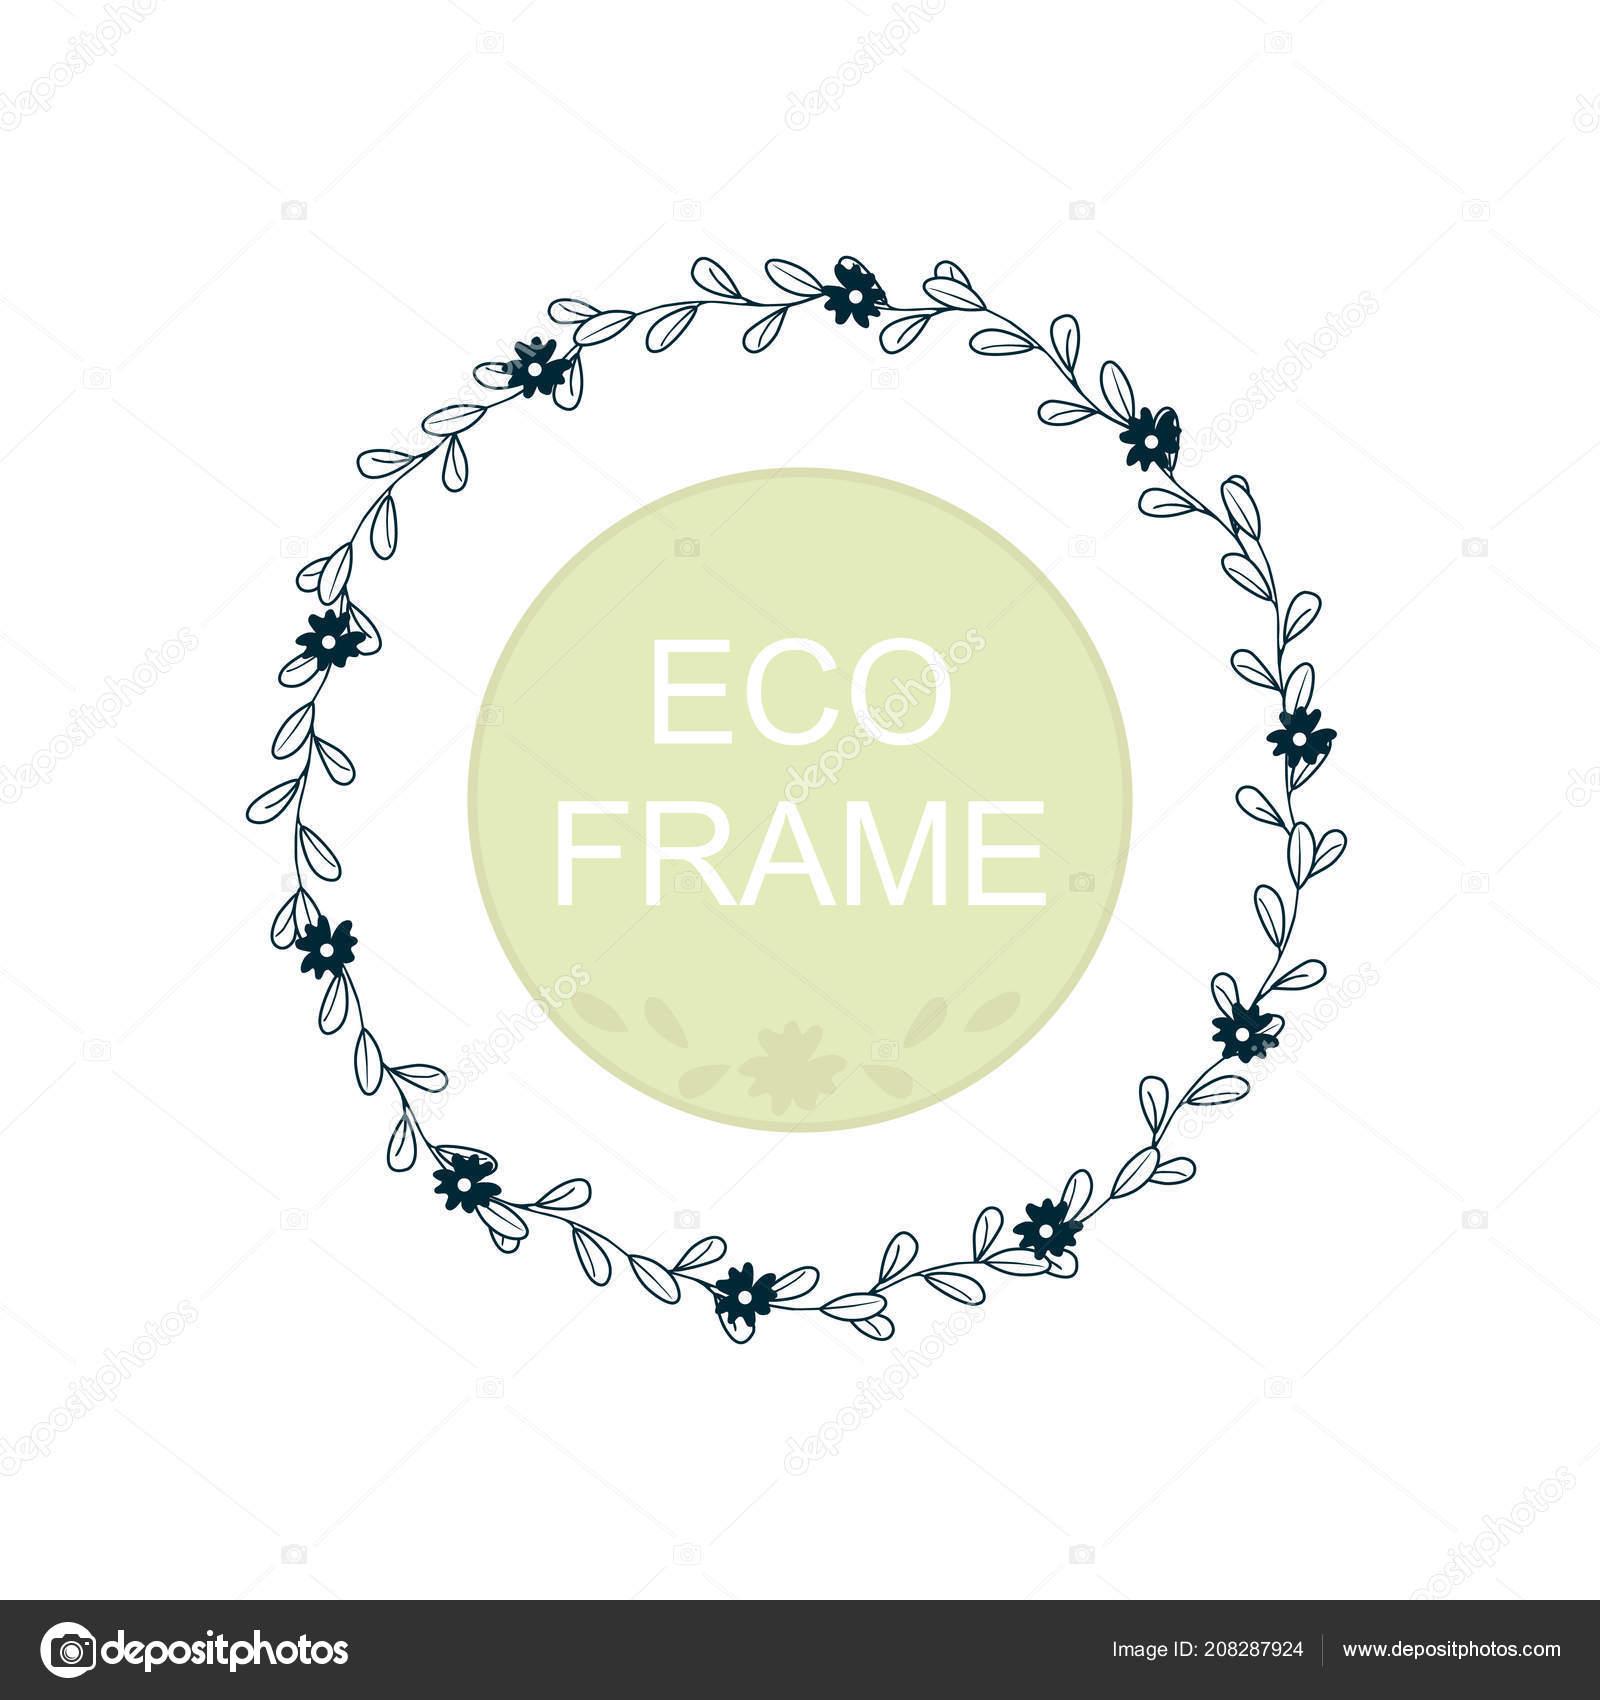 Eco frame wreath greeting card design wedding invitations logos eco frame wreath greeting card design wedding invitations logos business vetores de stock stopboris Images